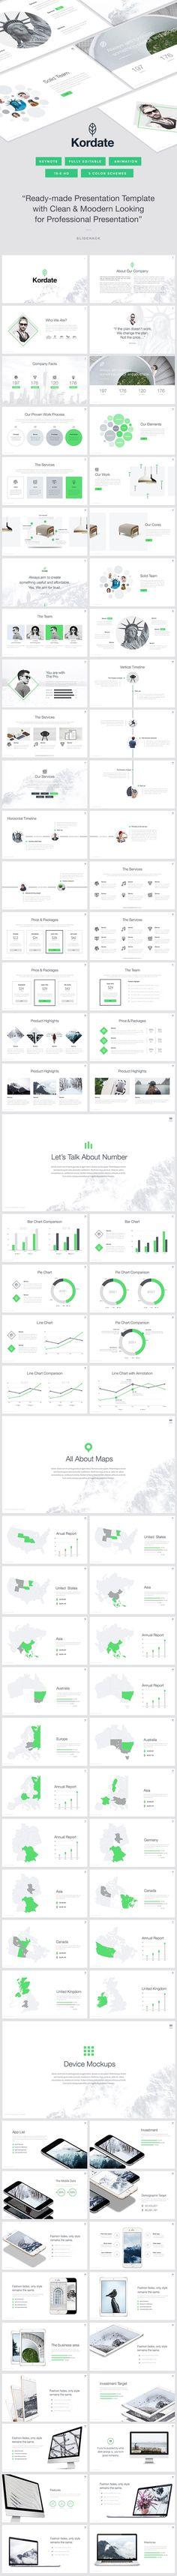 Business Strategy Keynote Template   Company Profile